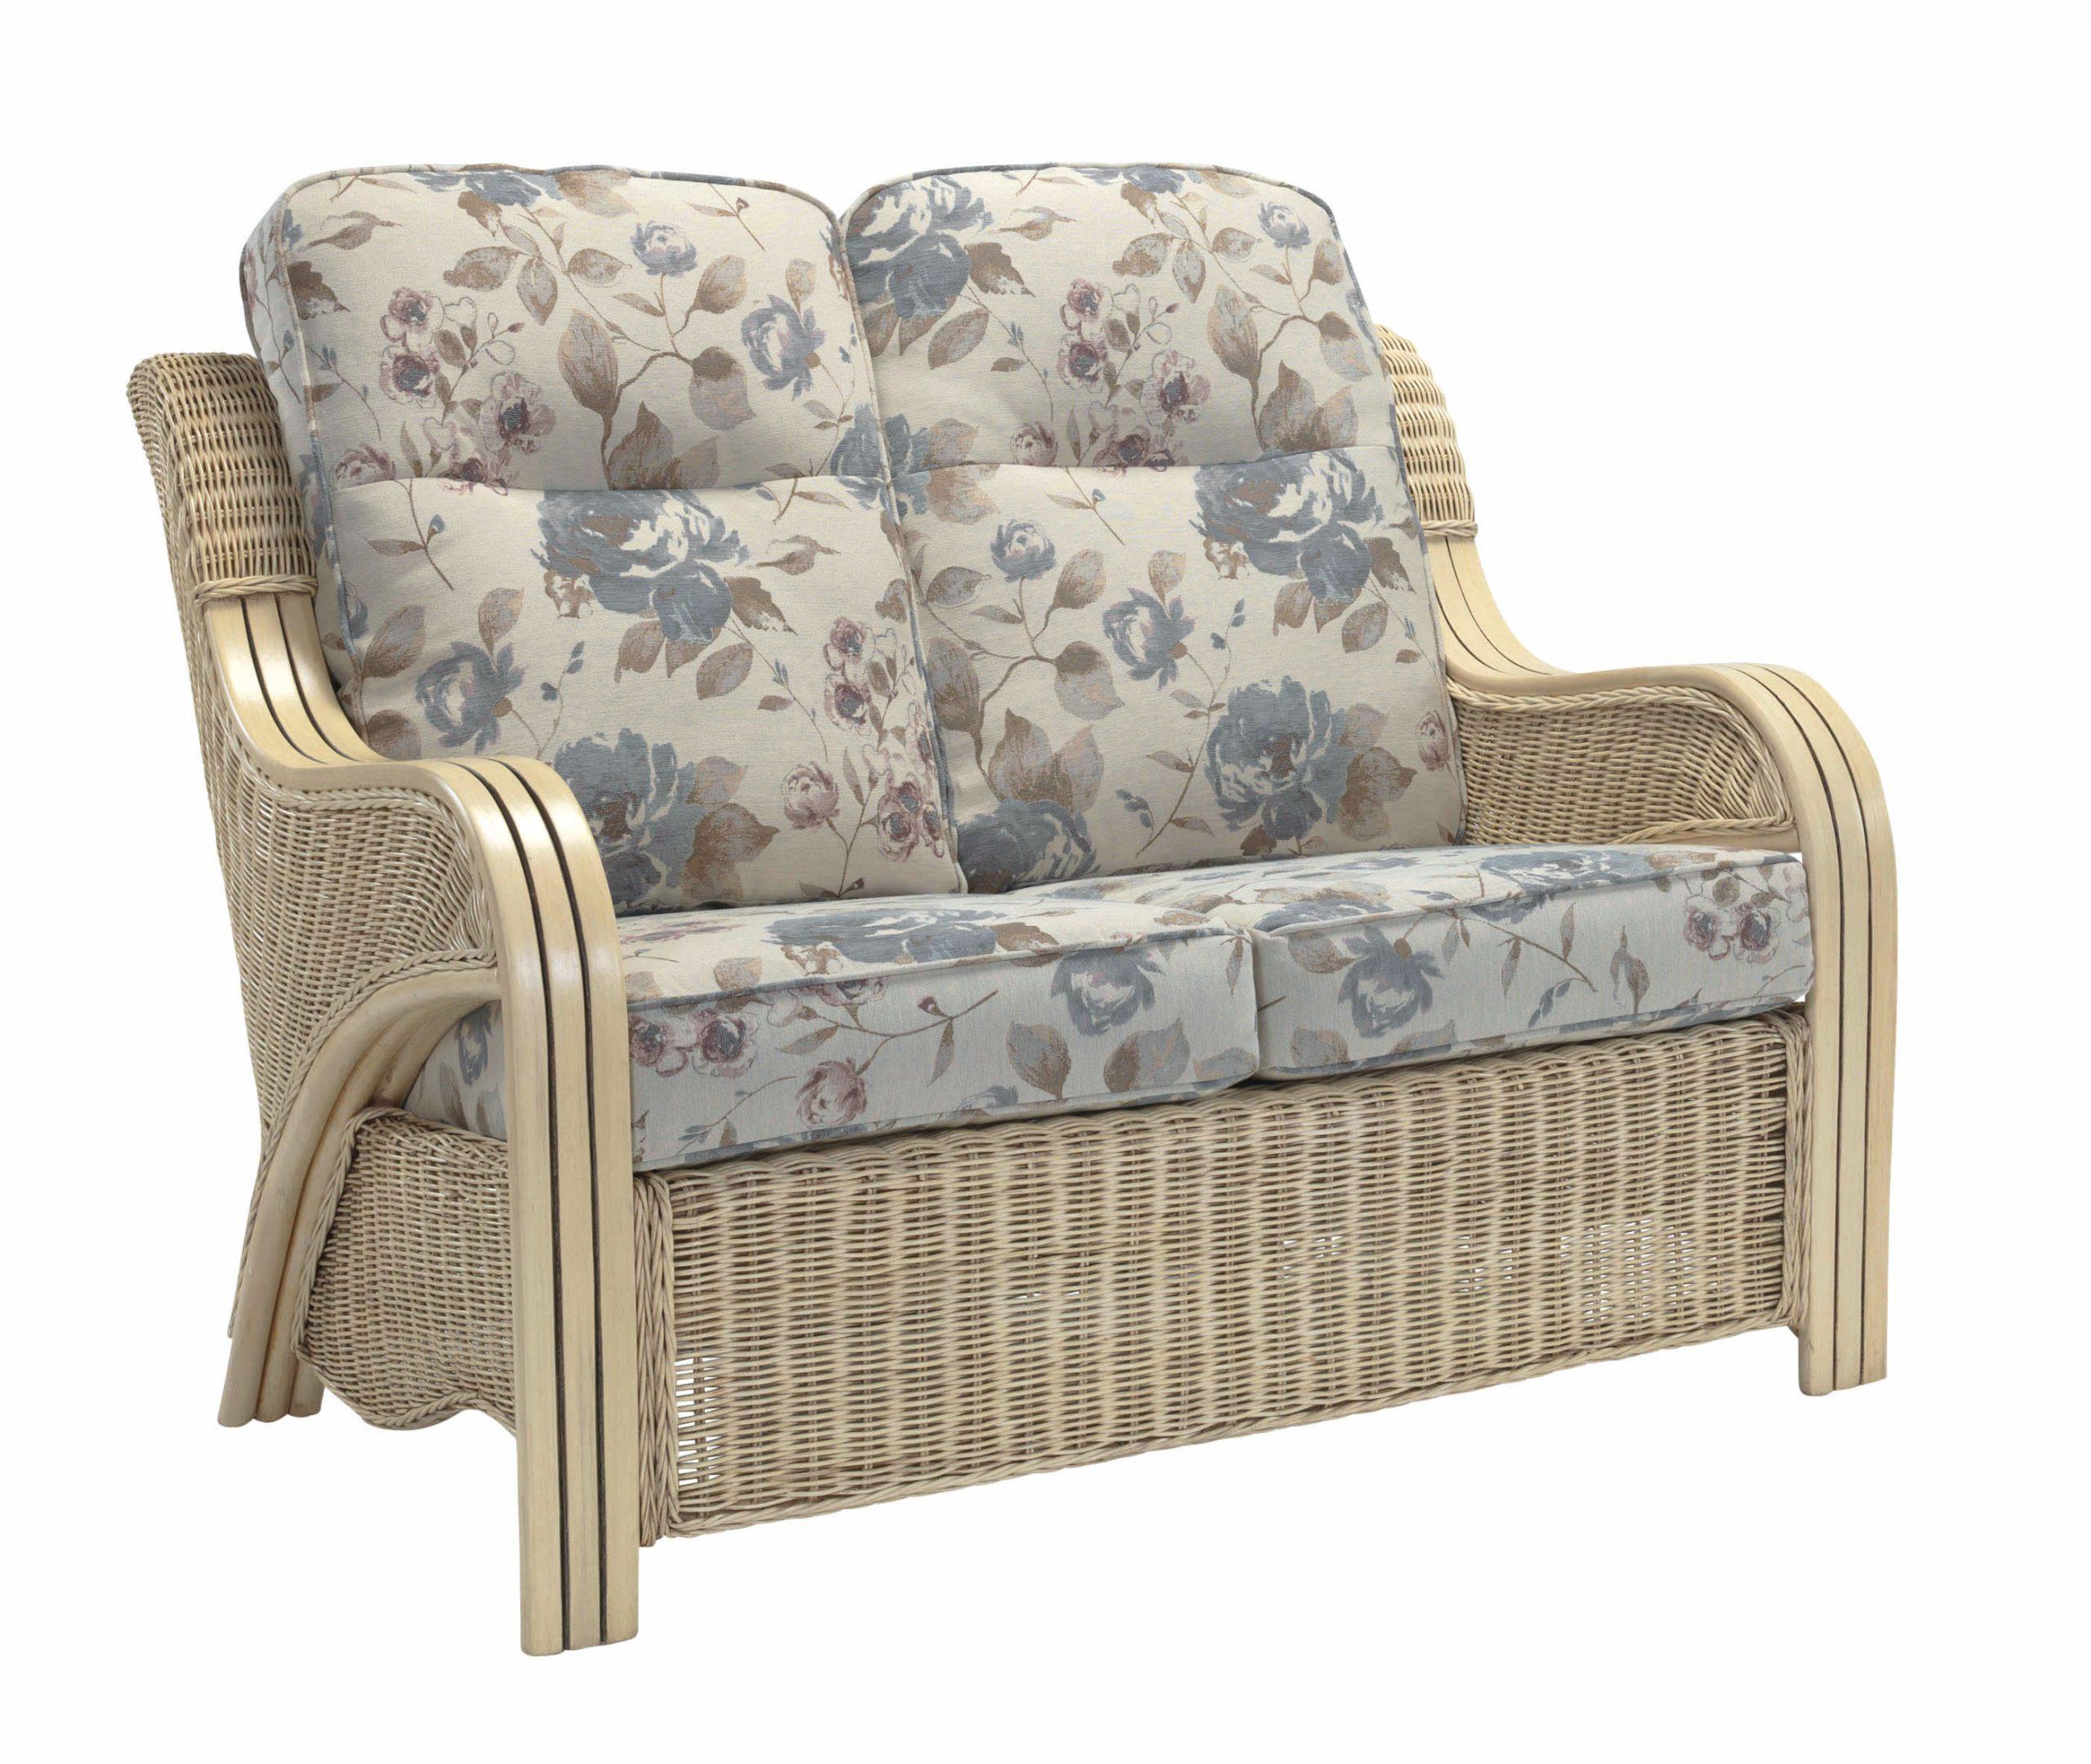 Desser Opera 3 Seater Sofa Sold at Highgate Furniture Southend On sea Essex